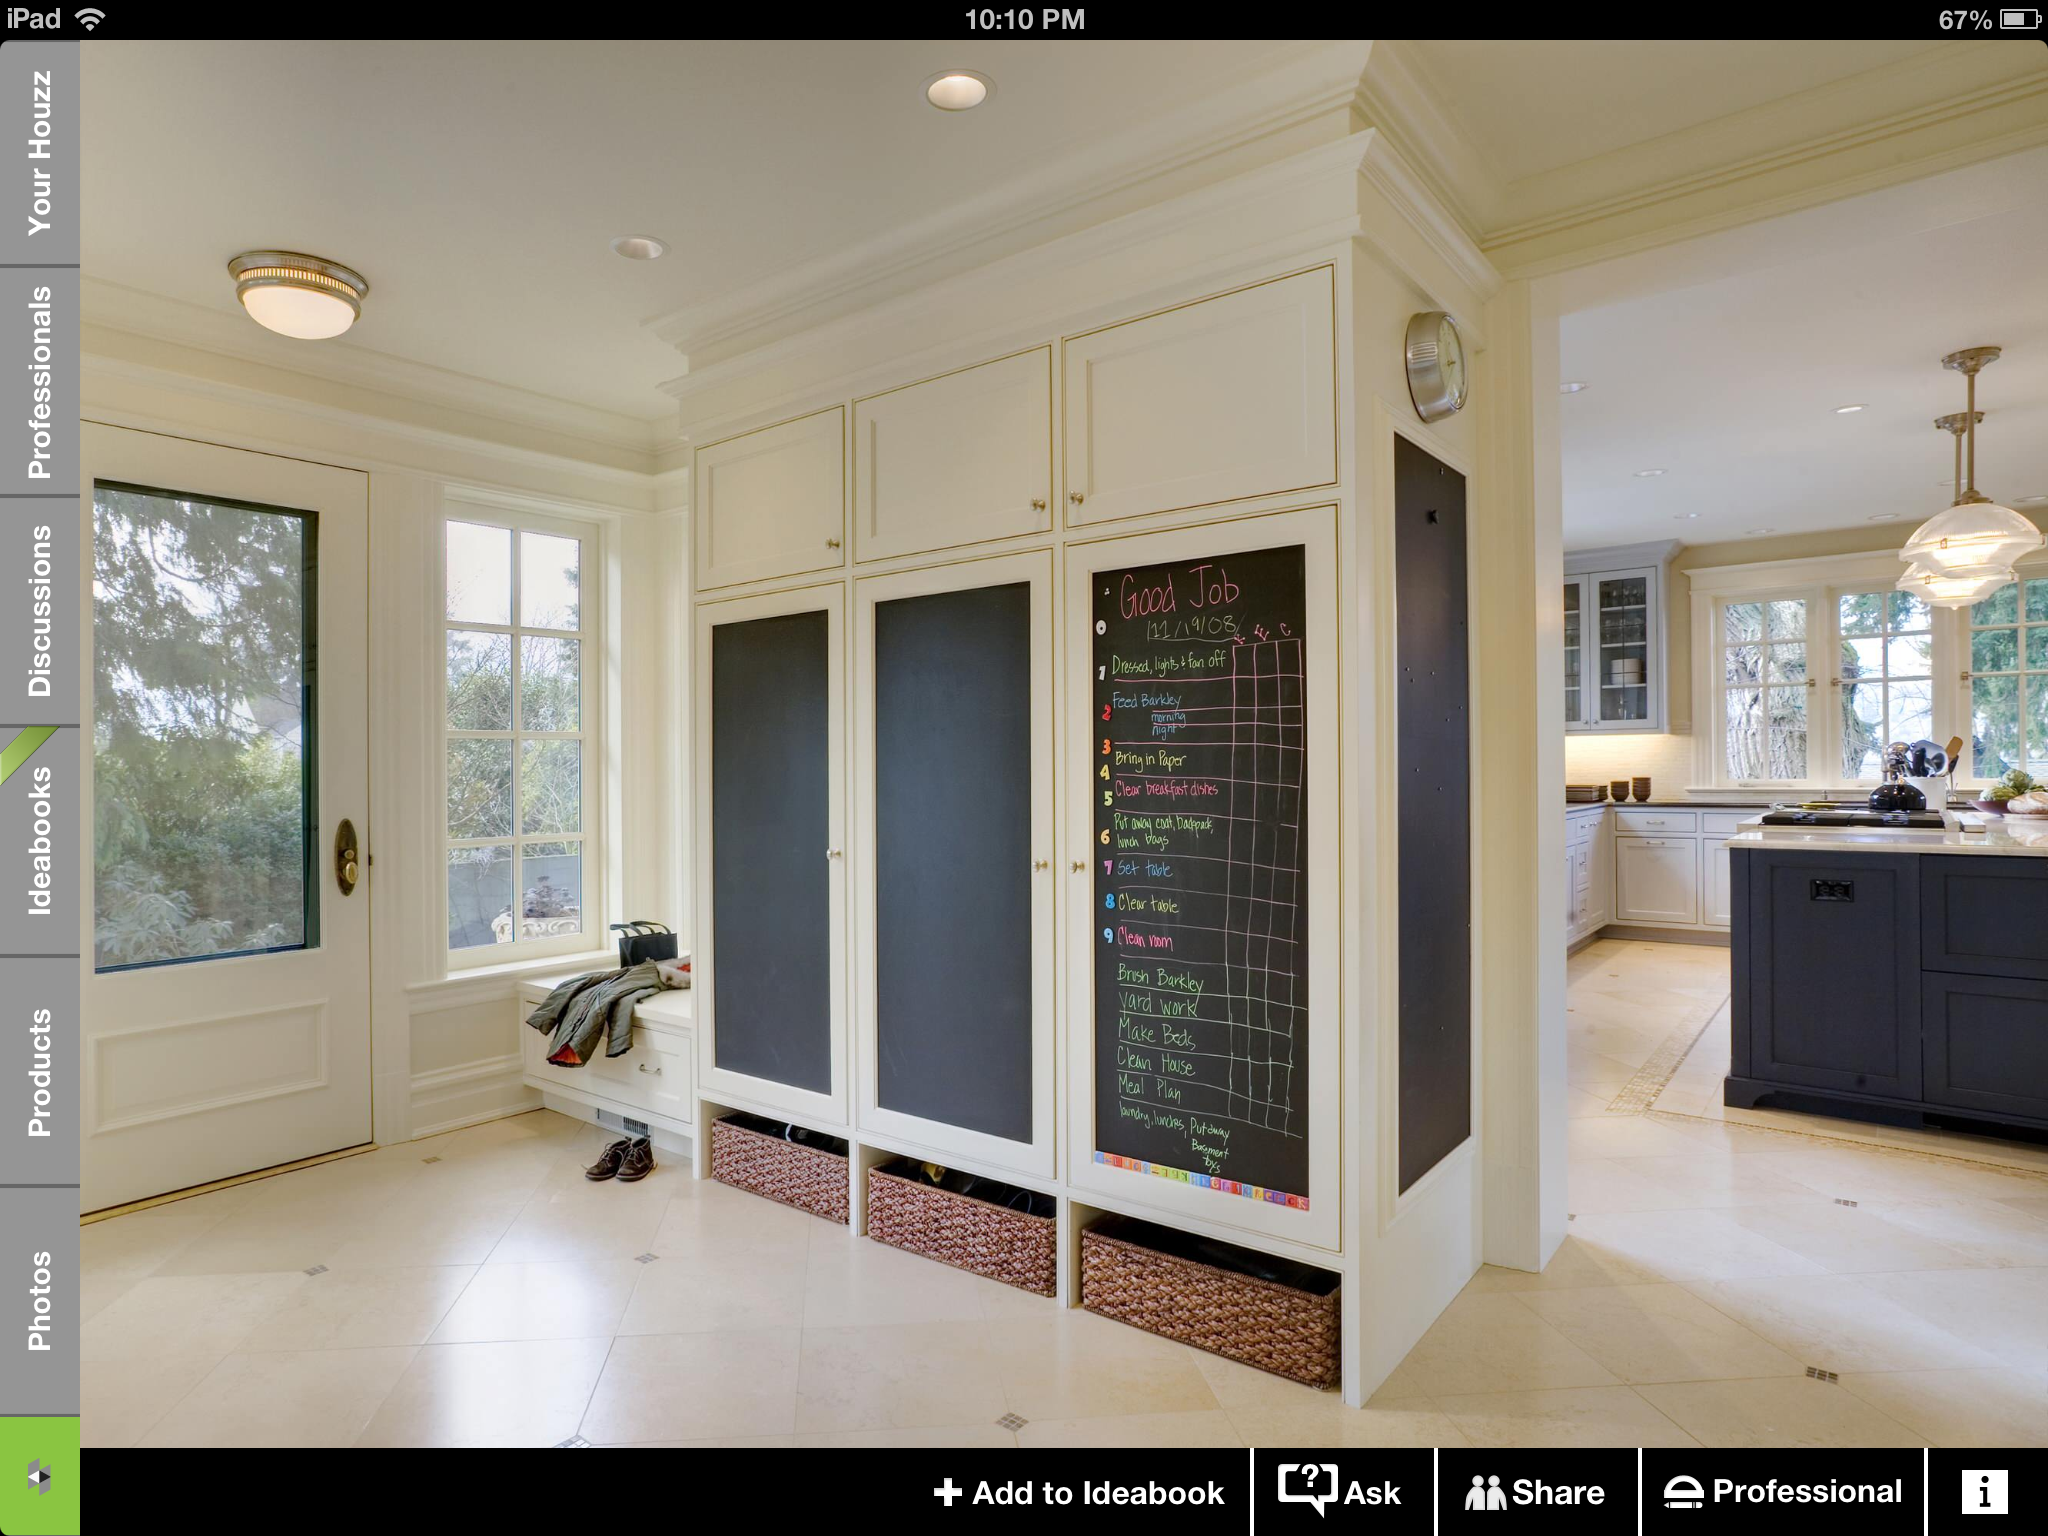 Chalk board mud room suggestion renovation pinterest mud rooms